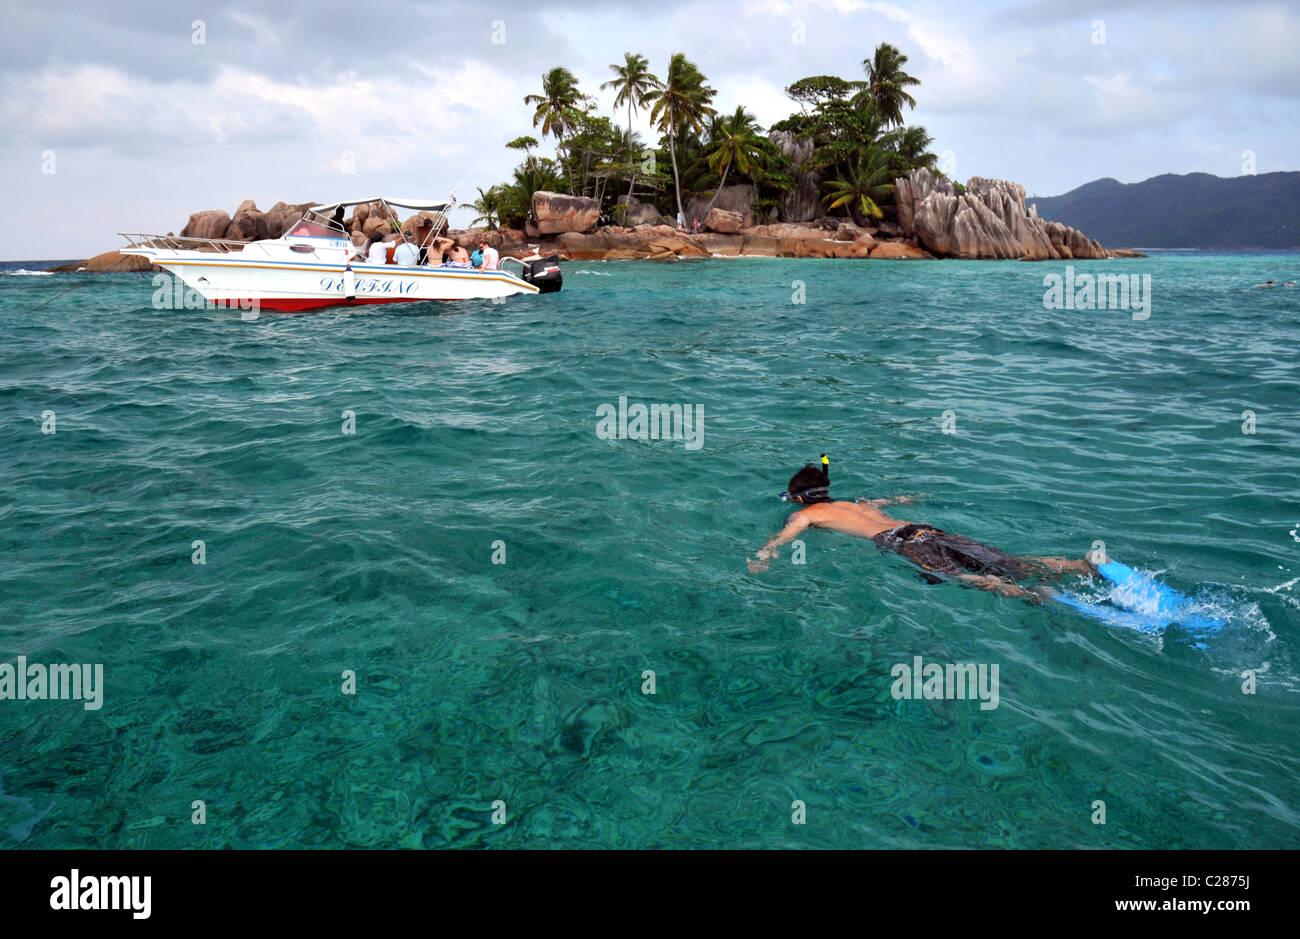 Snorkeling St Pierre Island, Seychelles. - Stock Image